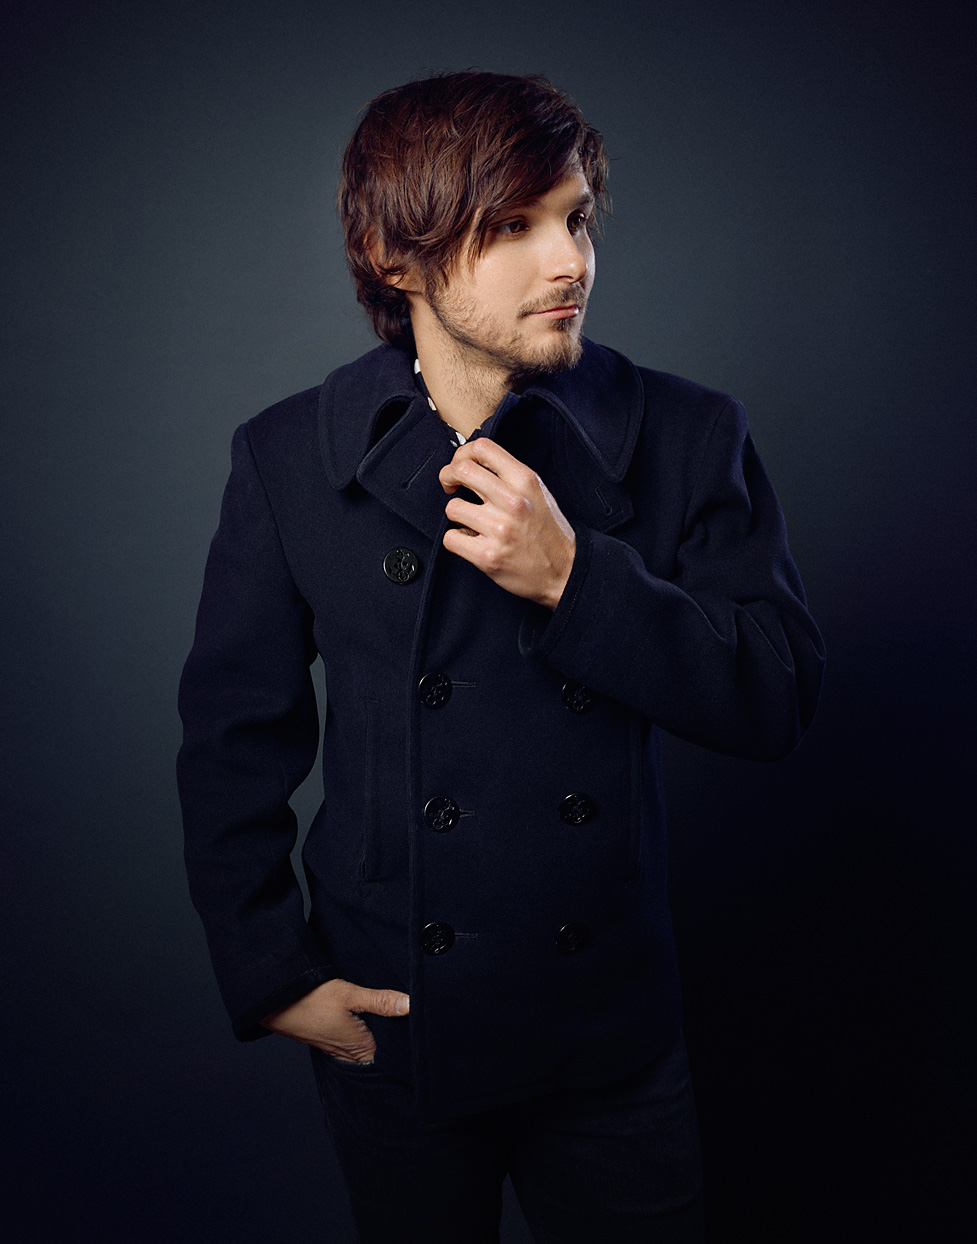 Mark DeLong - Celebrity Photographer - Actor in a blue pea coat.